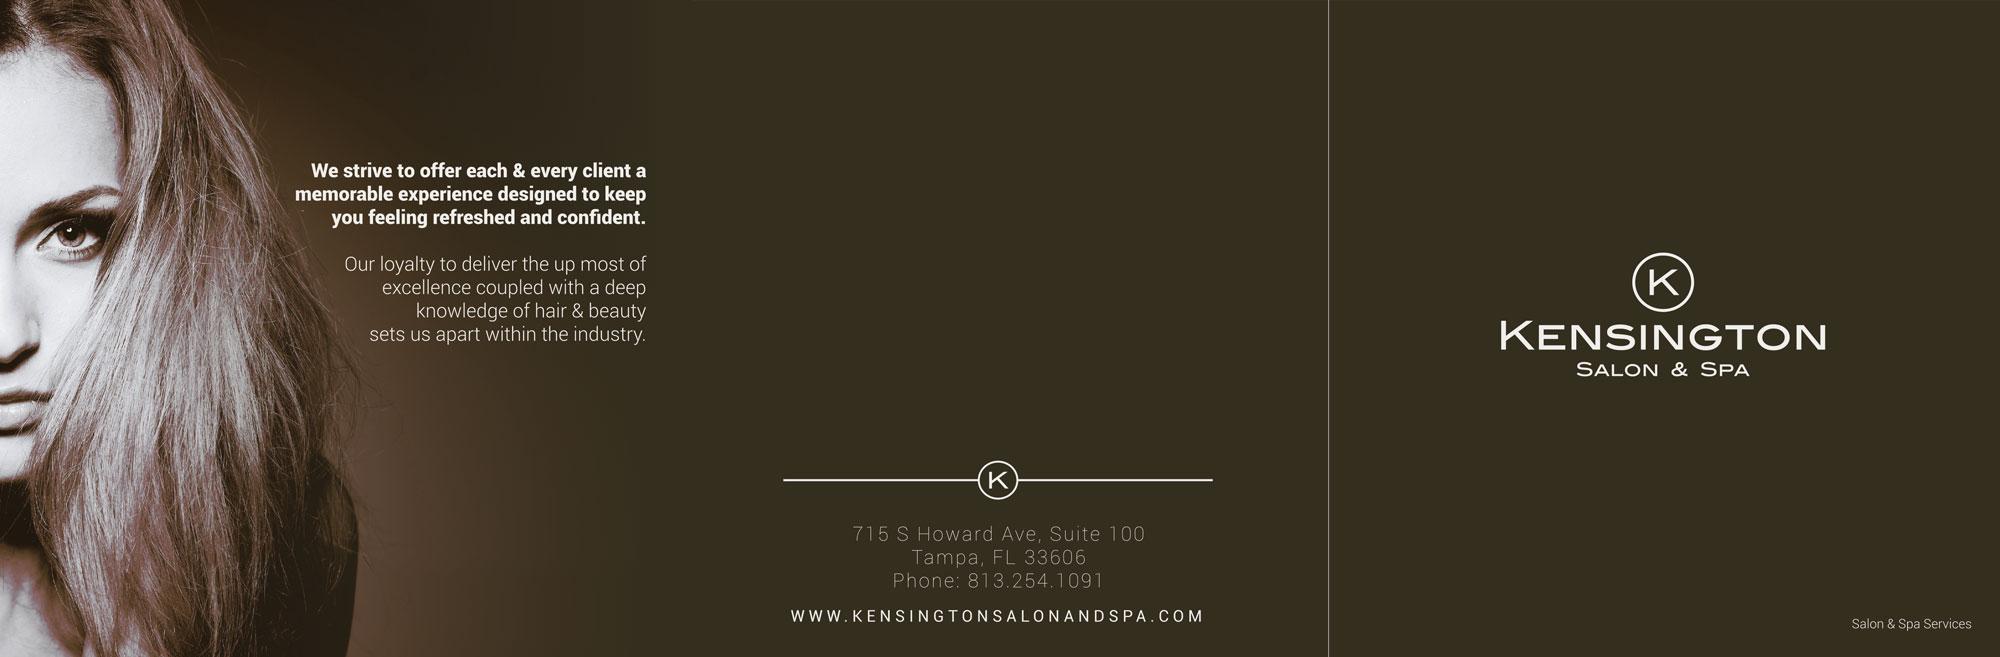 Kensington-print-1